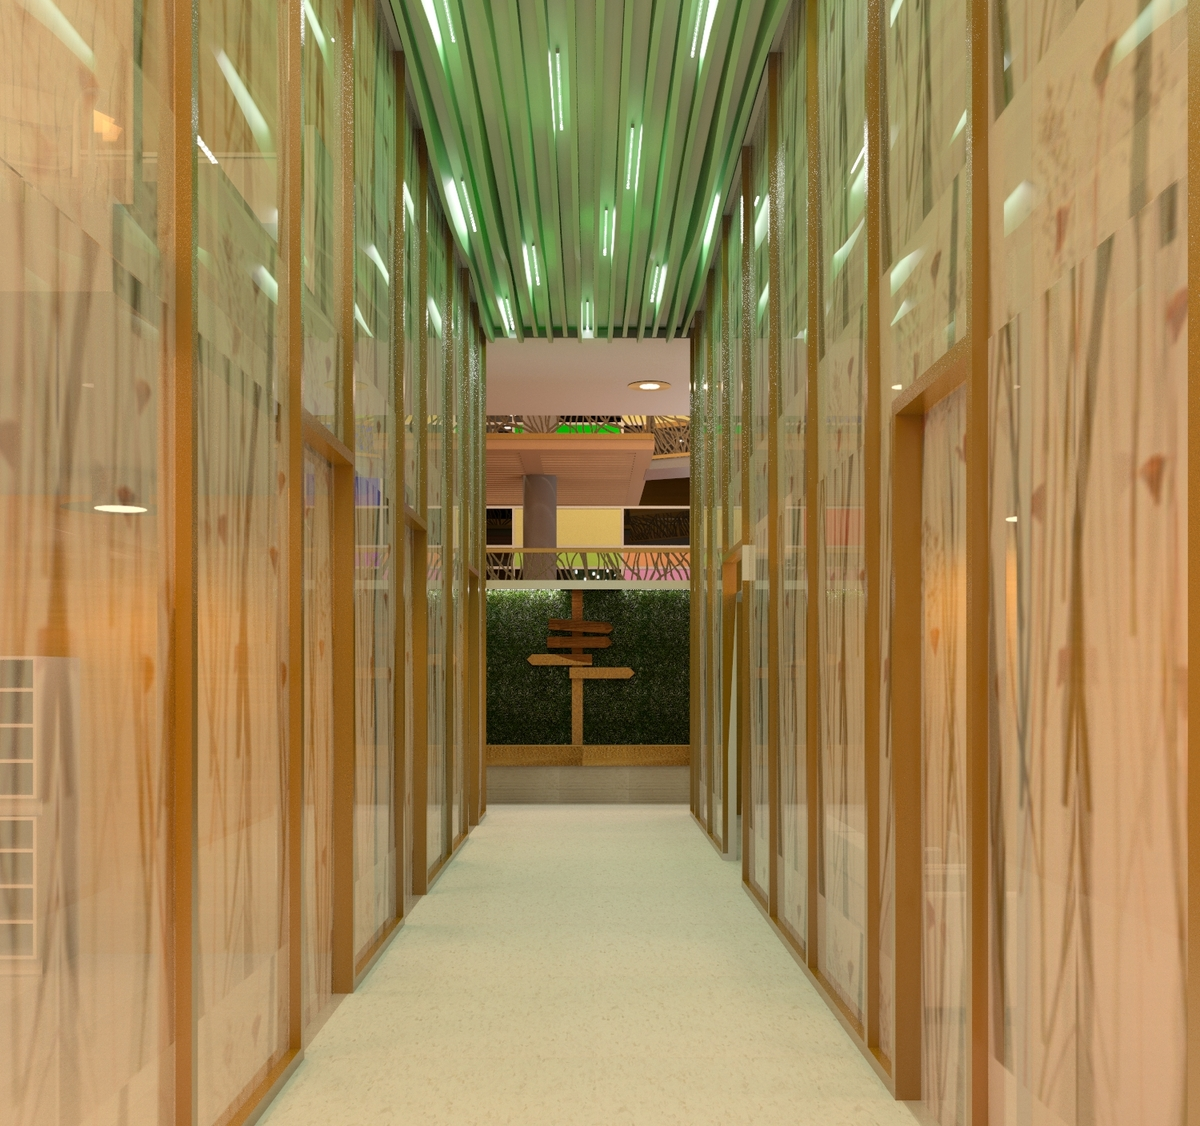 124891750 on Interior Design Firms Ct